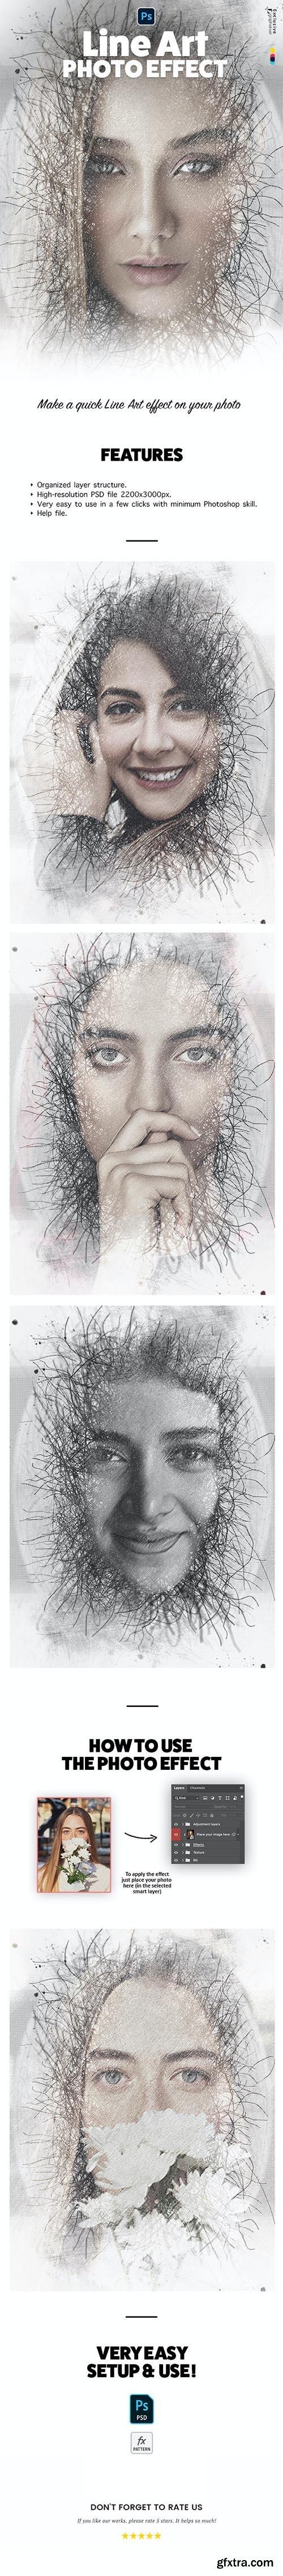 GraphicRiver - Line Art Photo Effect 33286989